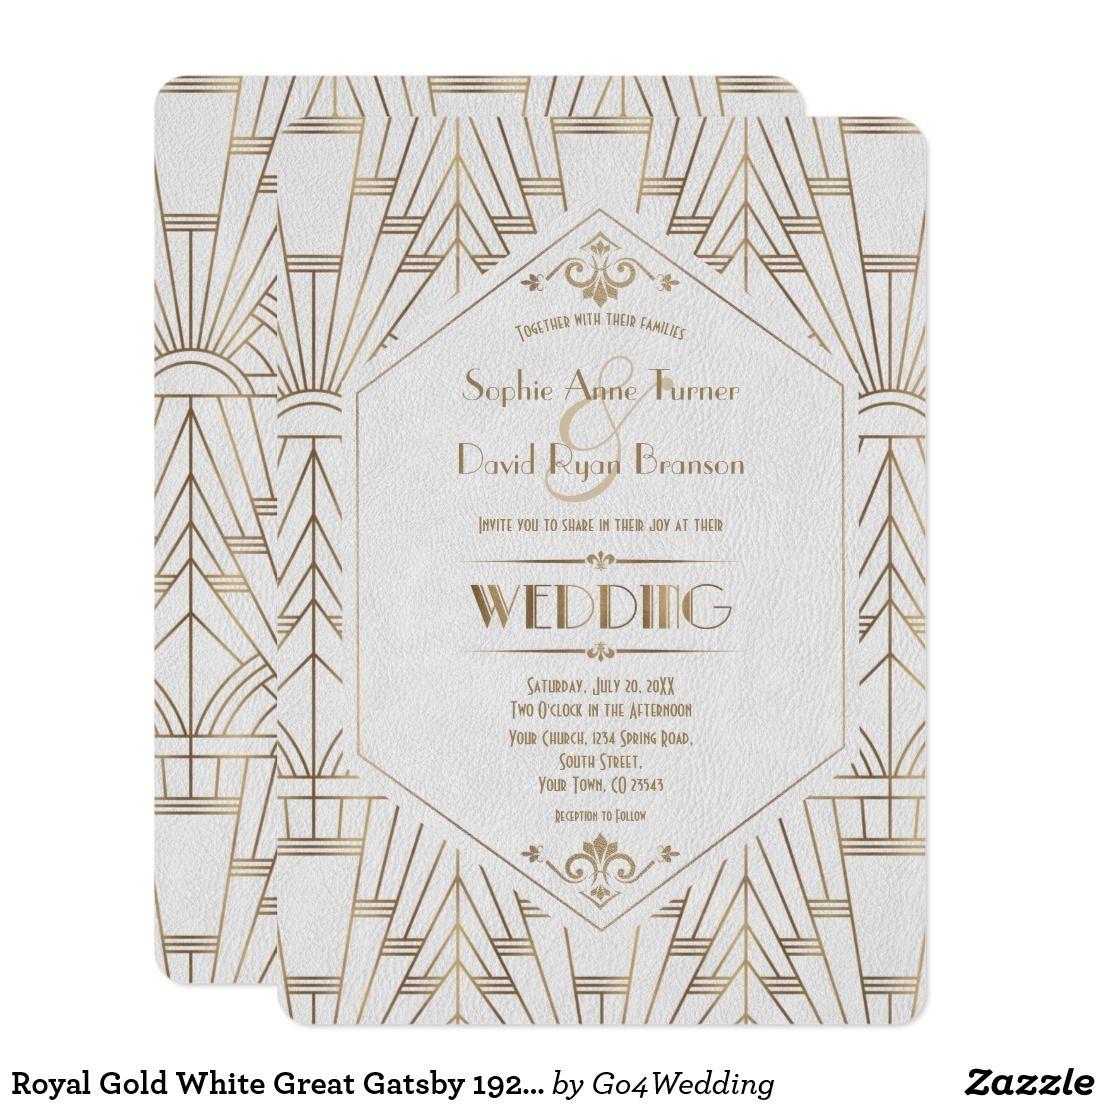 Royal Gold White Great Gatsby 1920s Wedding Invitation Zazzle Com In 2021 Art Deco Wedding Invitations 1920s Wedding Invitations Gatsby Wedding Invitations